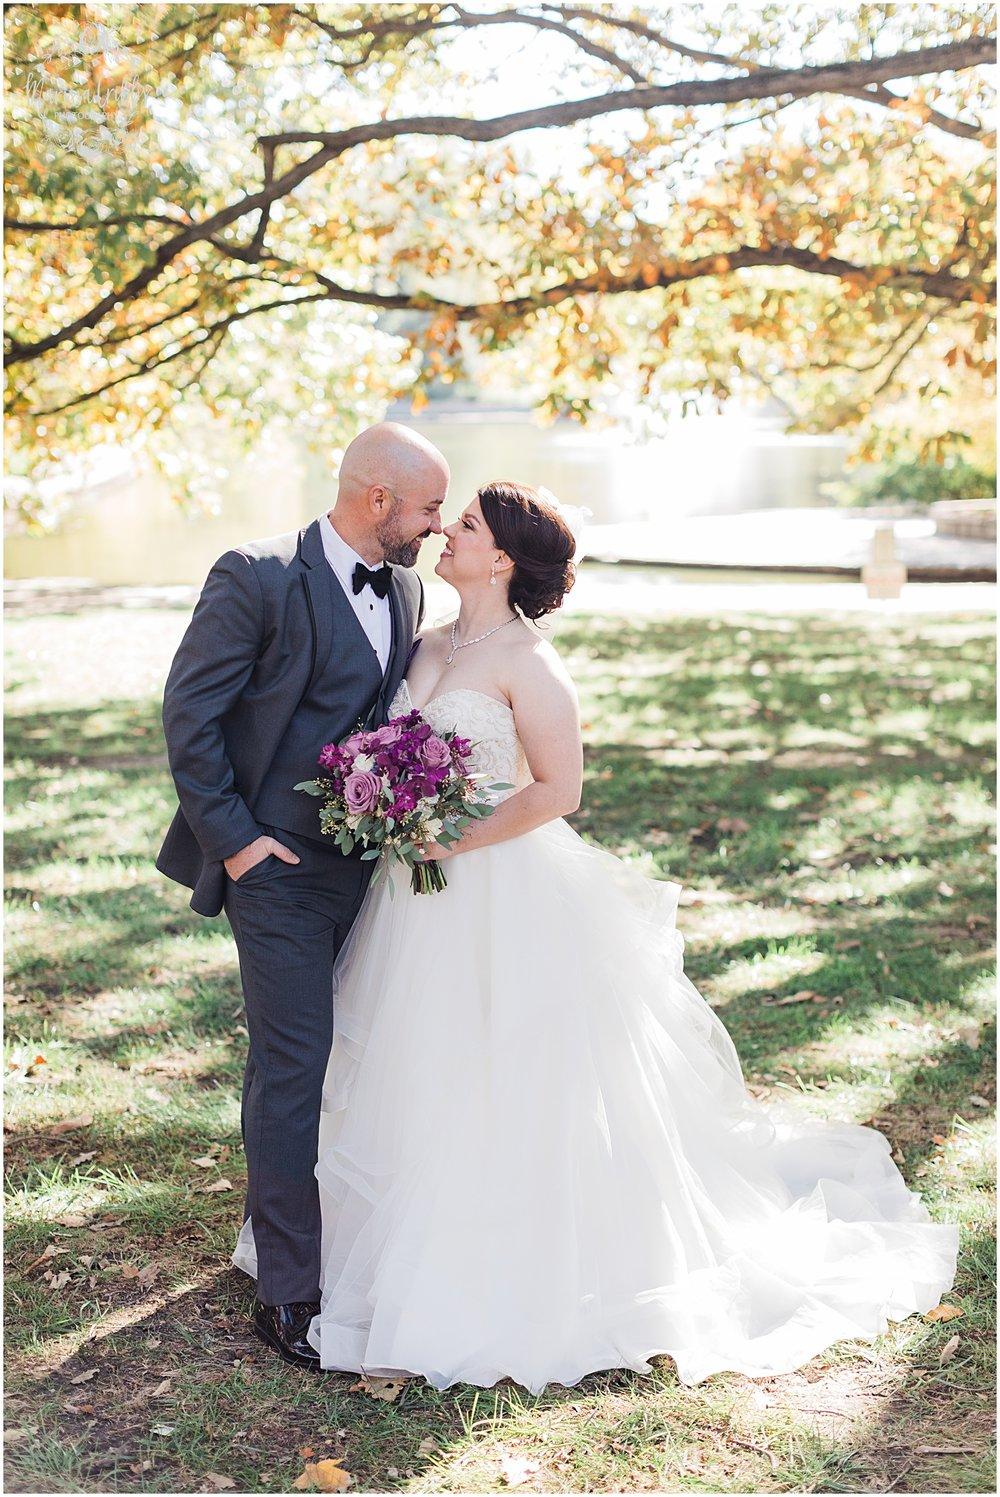 LAURA & DAN MARRIED | NELSON ATKINS MUSEUM | MARISSA CRIBBS PHOTOGRAPHY_7009.jpg